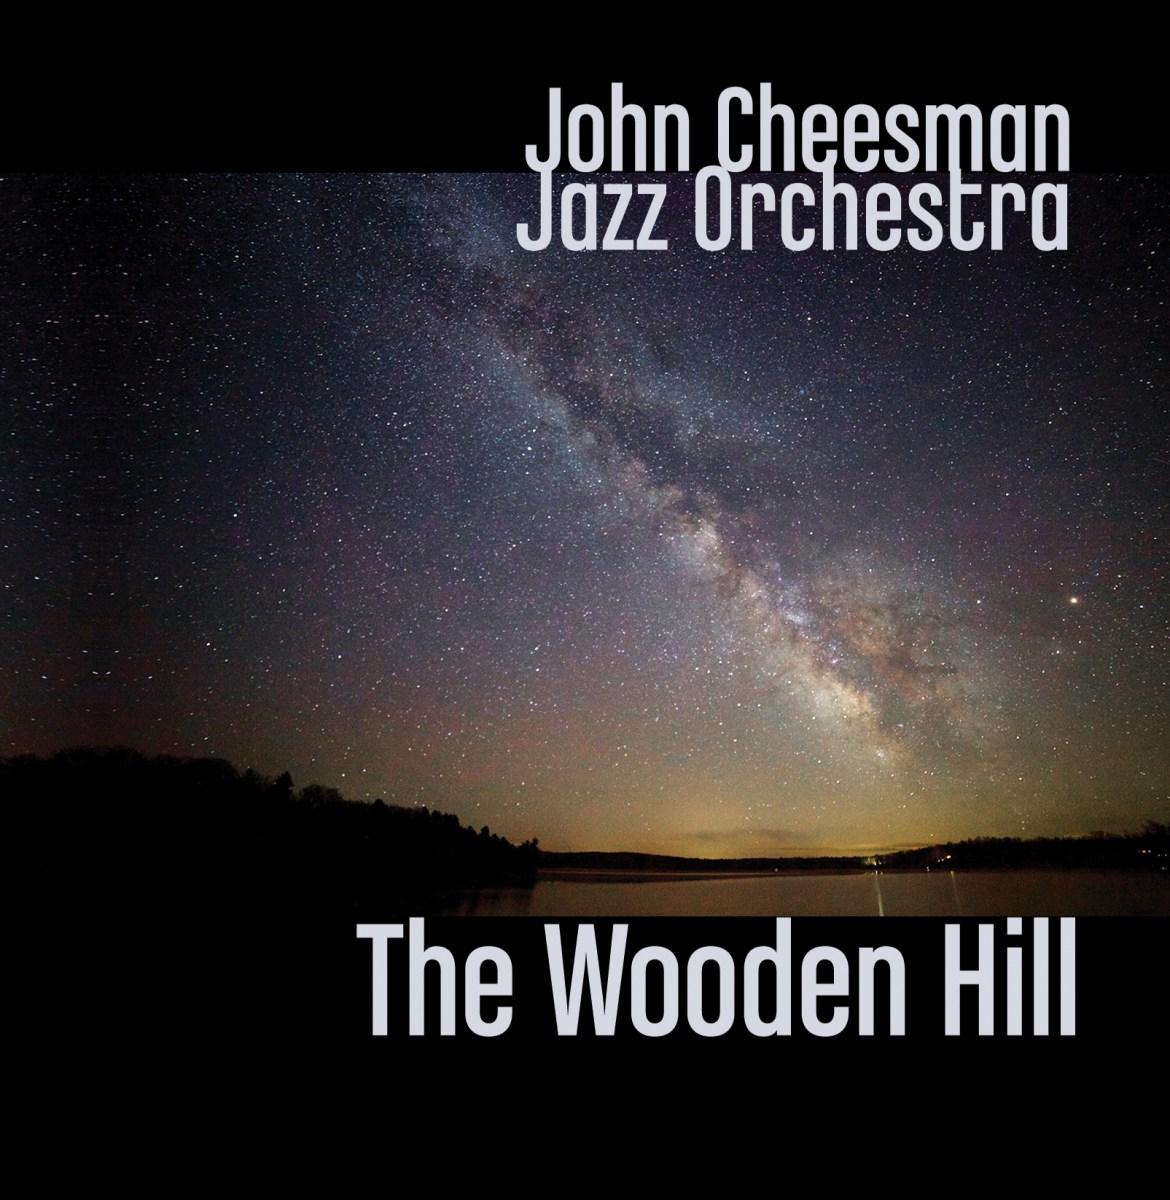 John Cheeseman Jazz Orchestra